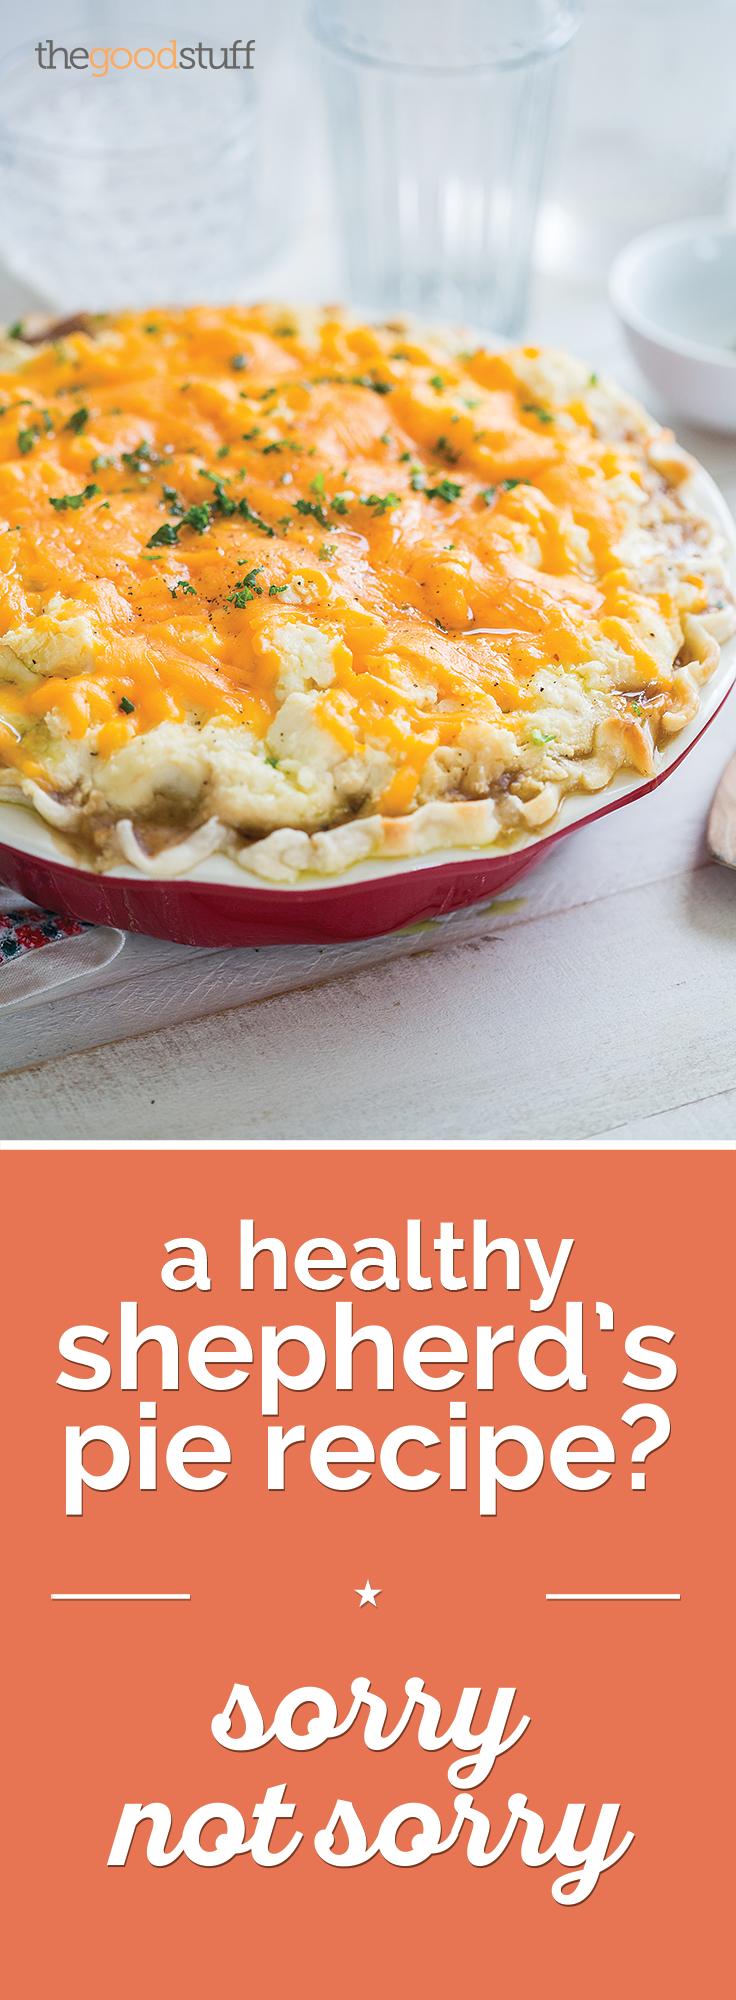 Easy Shepherd's Pie Recipe | thegoodstuff